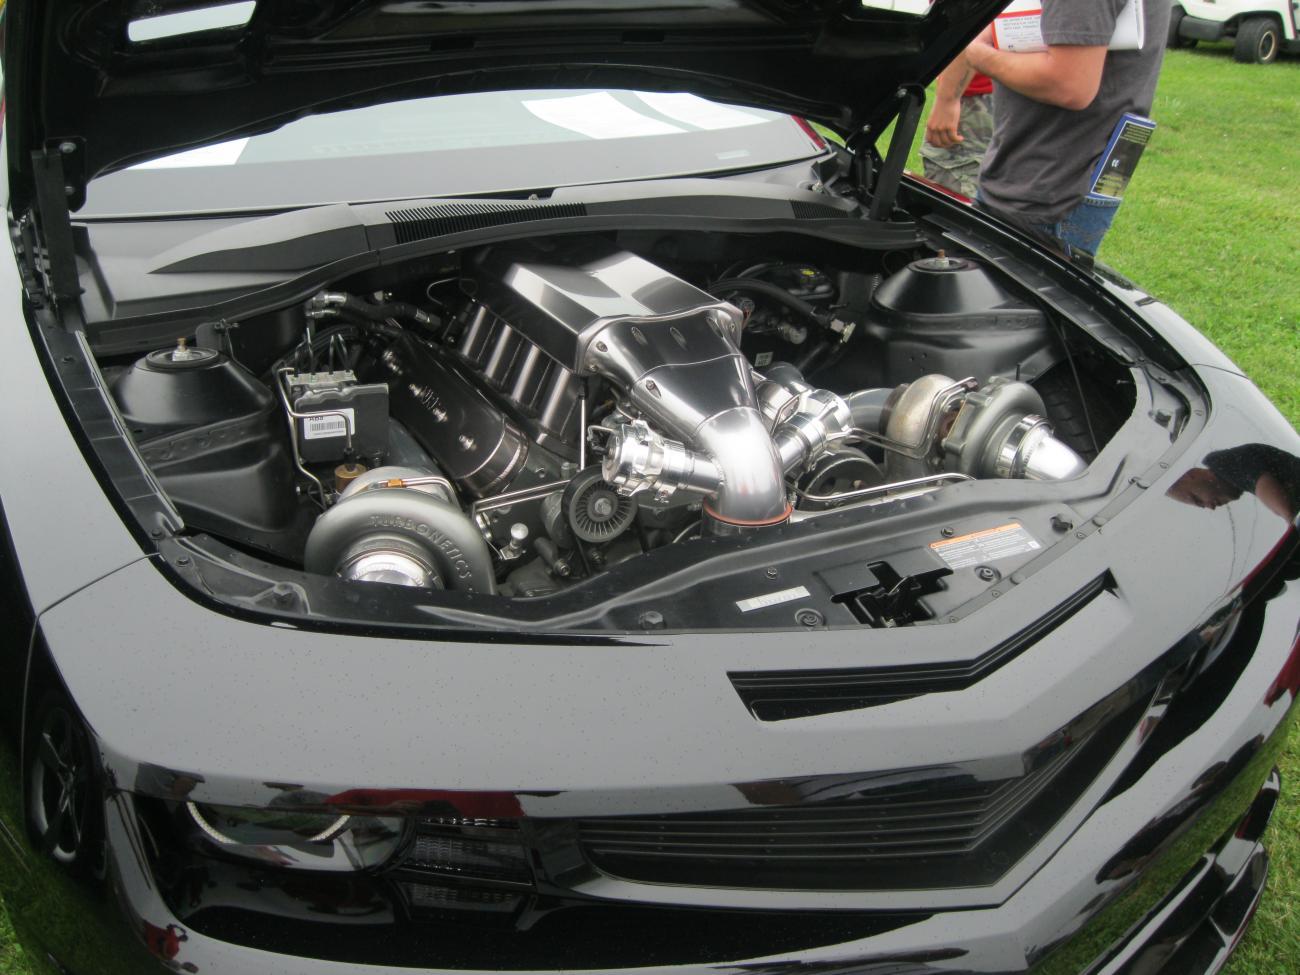 Twin Turbo Camaro Camaro5 Chevy Camaro Forum Camaro